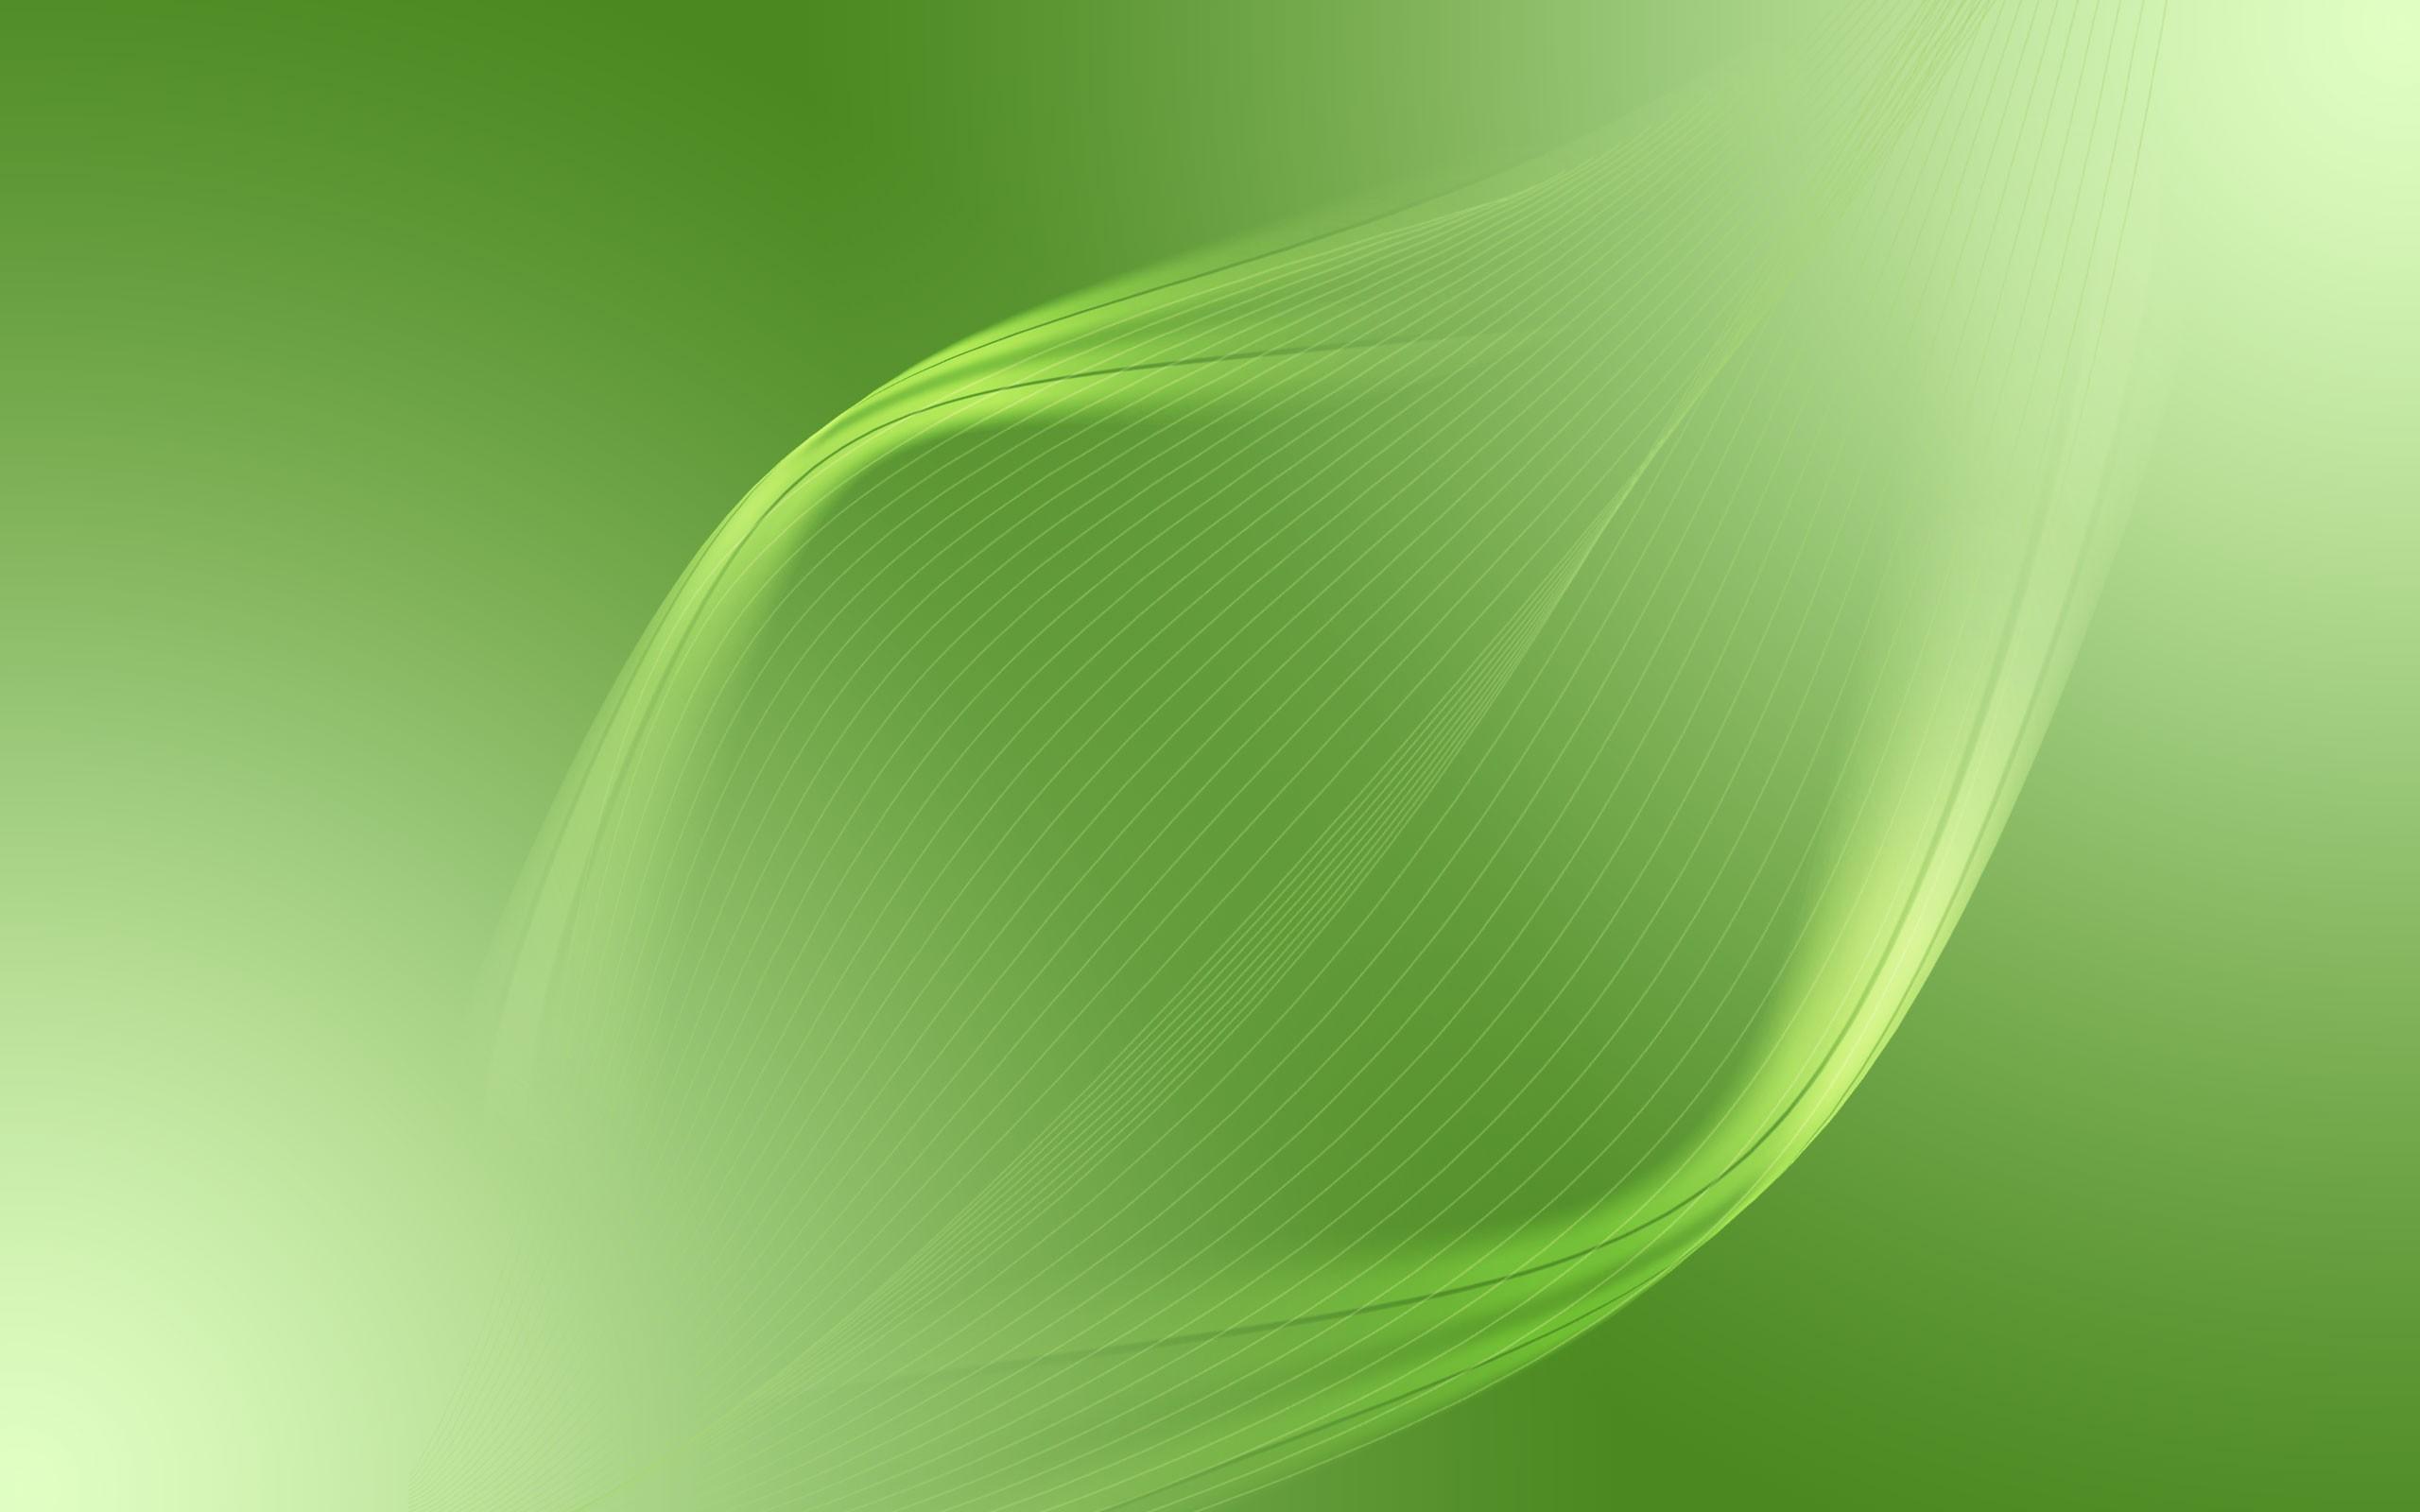 Mint Green wallpaper ·① Download free cool High Resolution ...